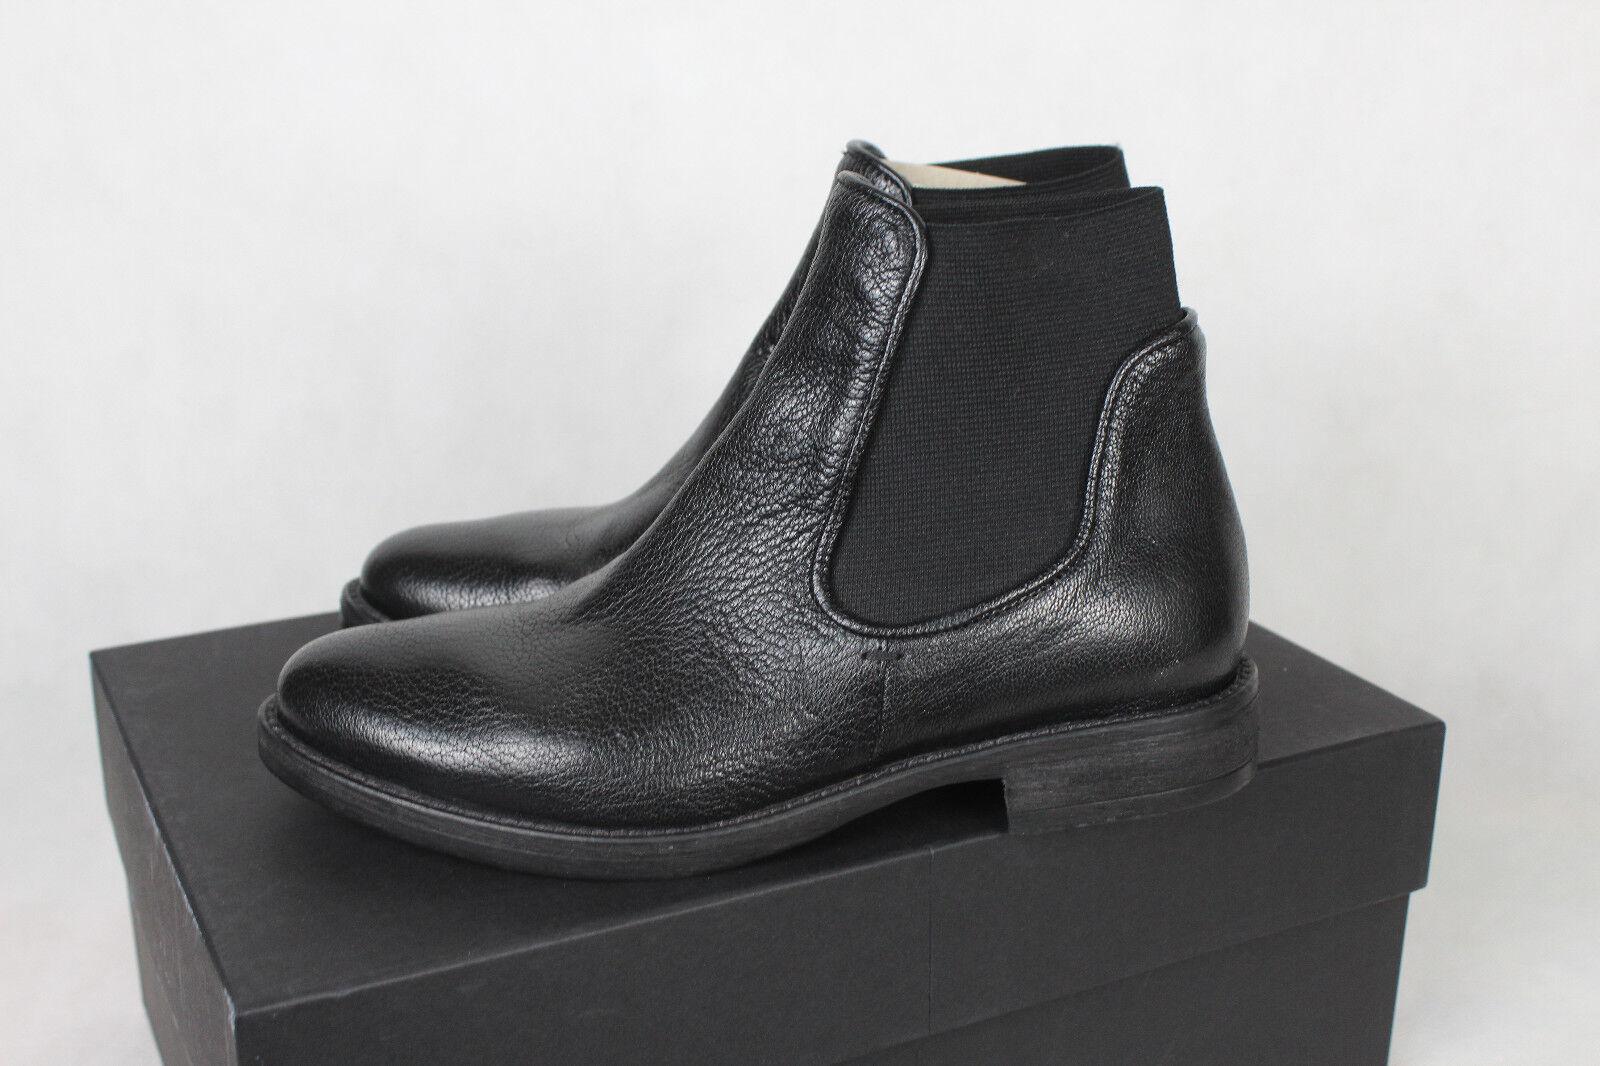 Fru . zapatos chelsea-botines, señora talla talla talla 36,neu.lp  mejor opcion